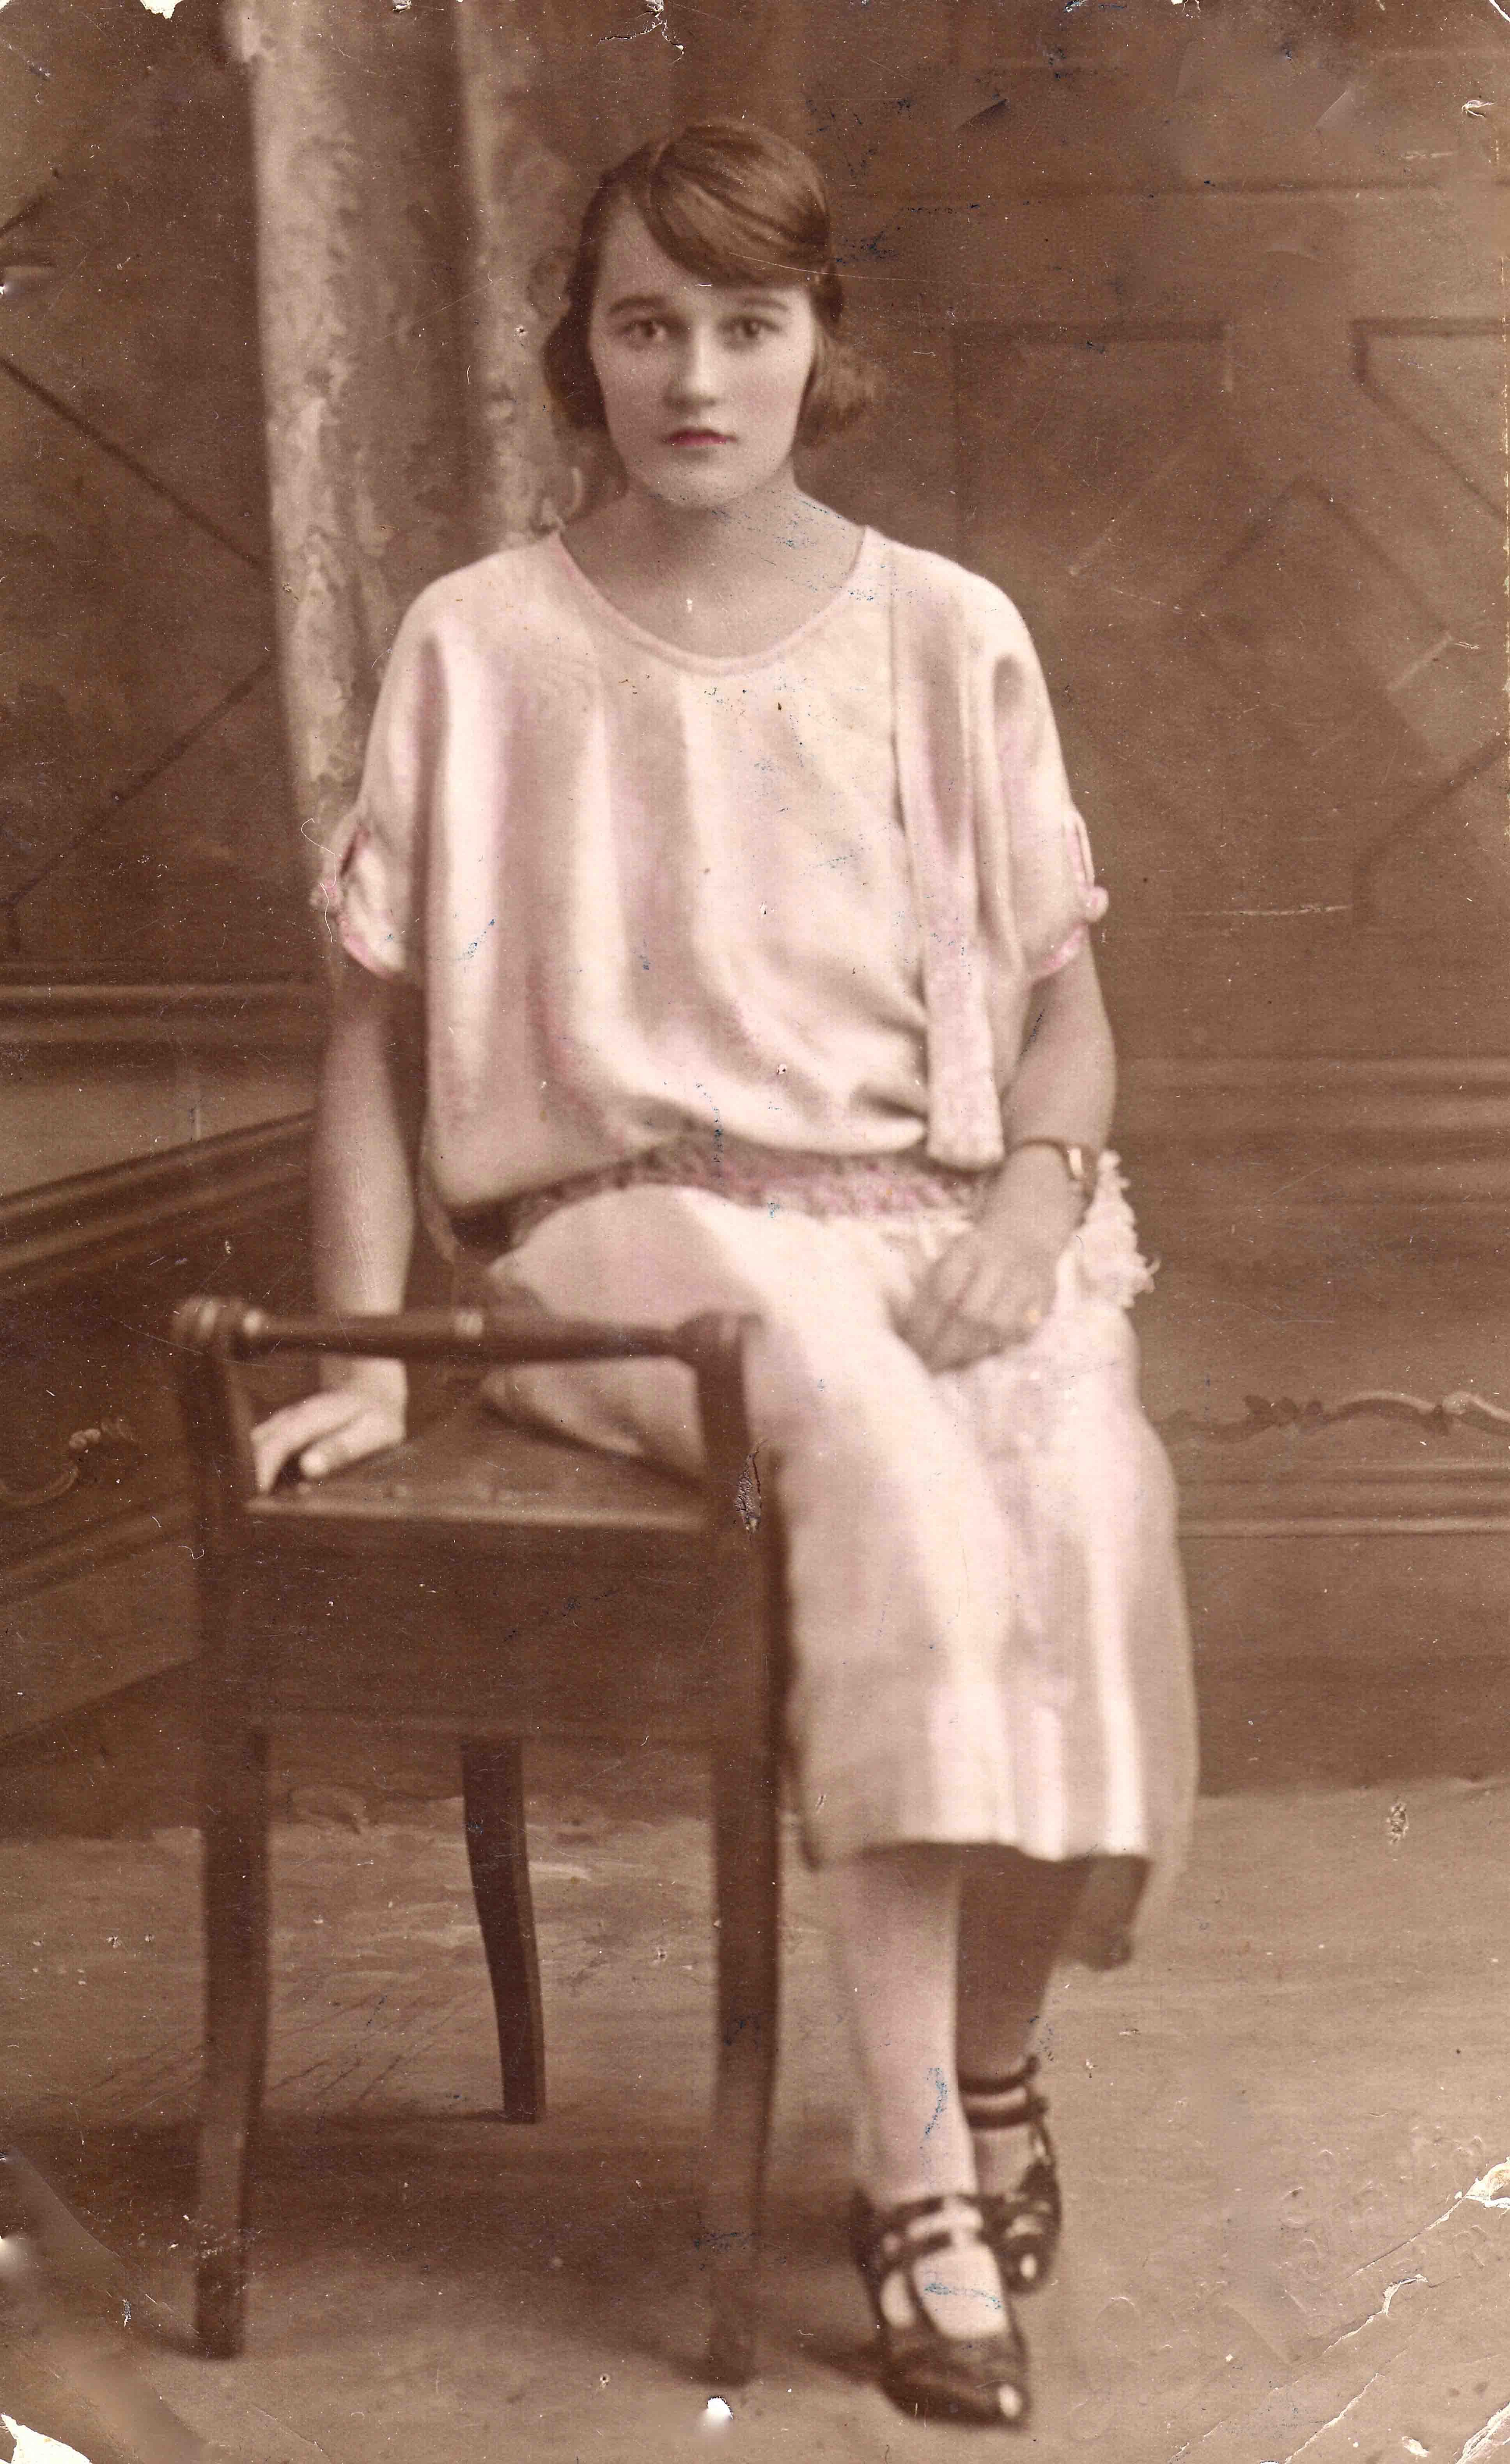 65. Olive Hale, c 1920